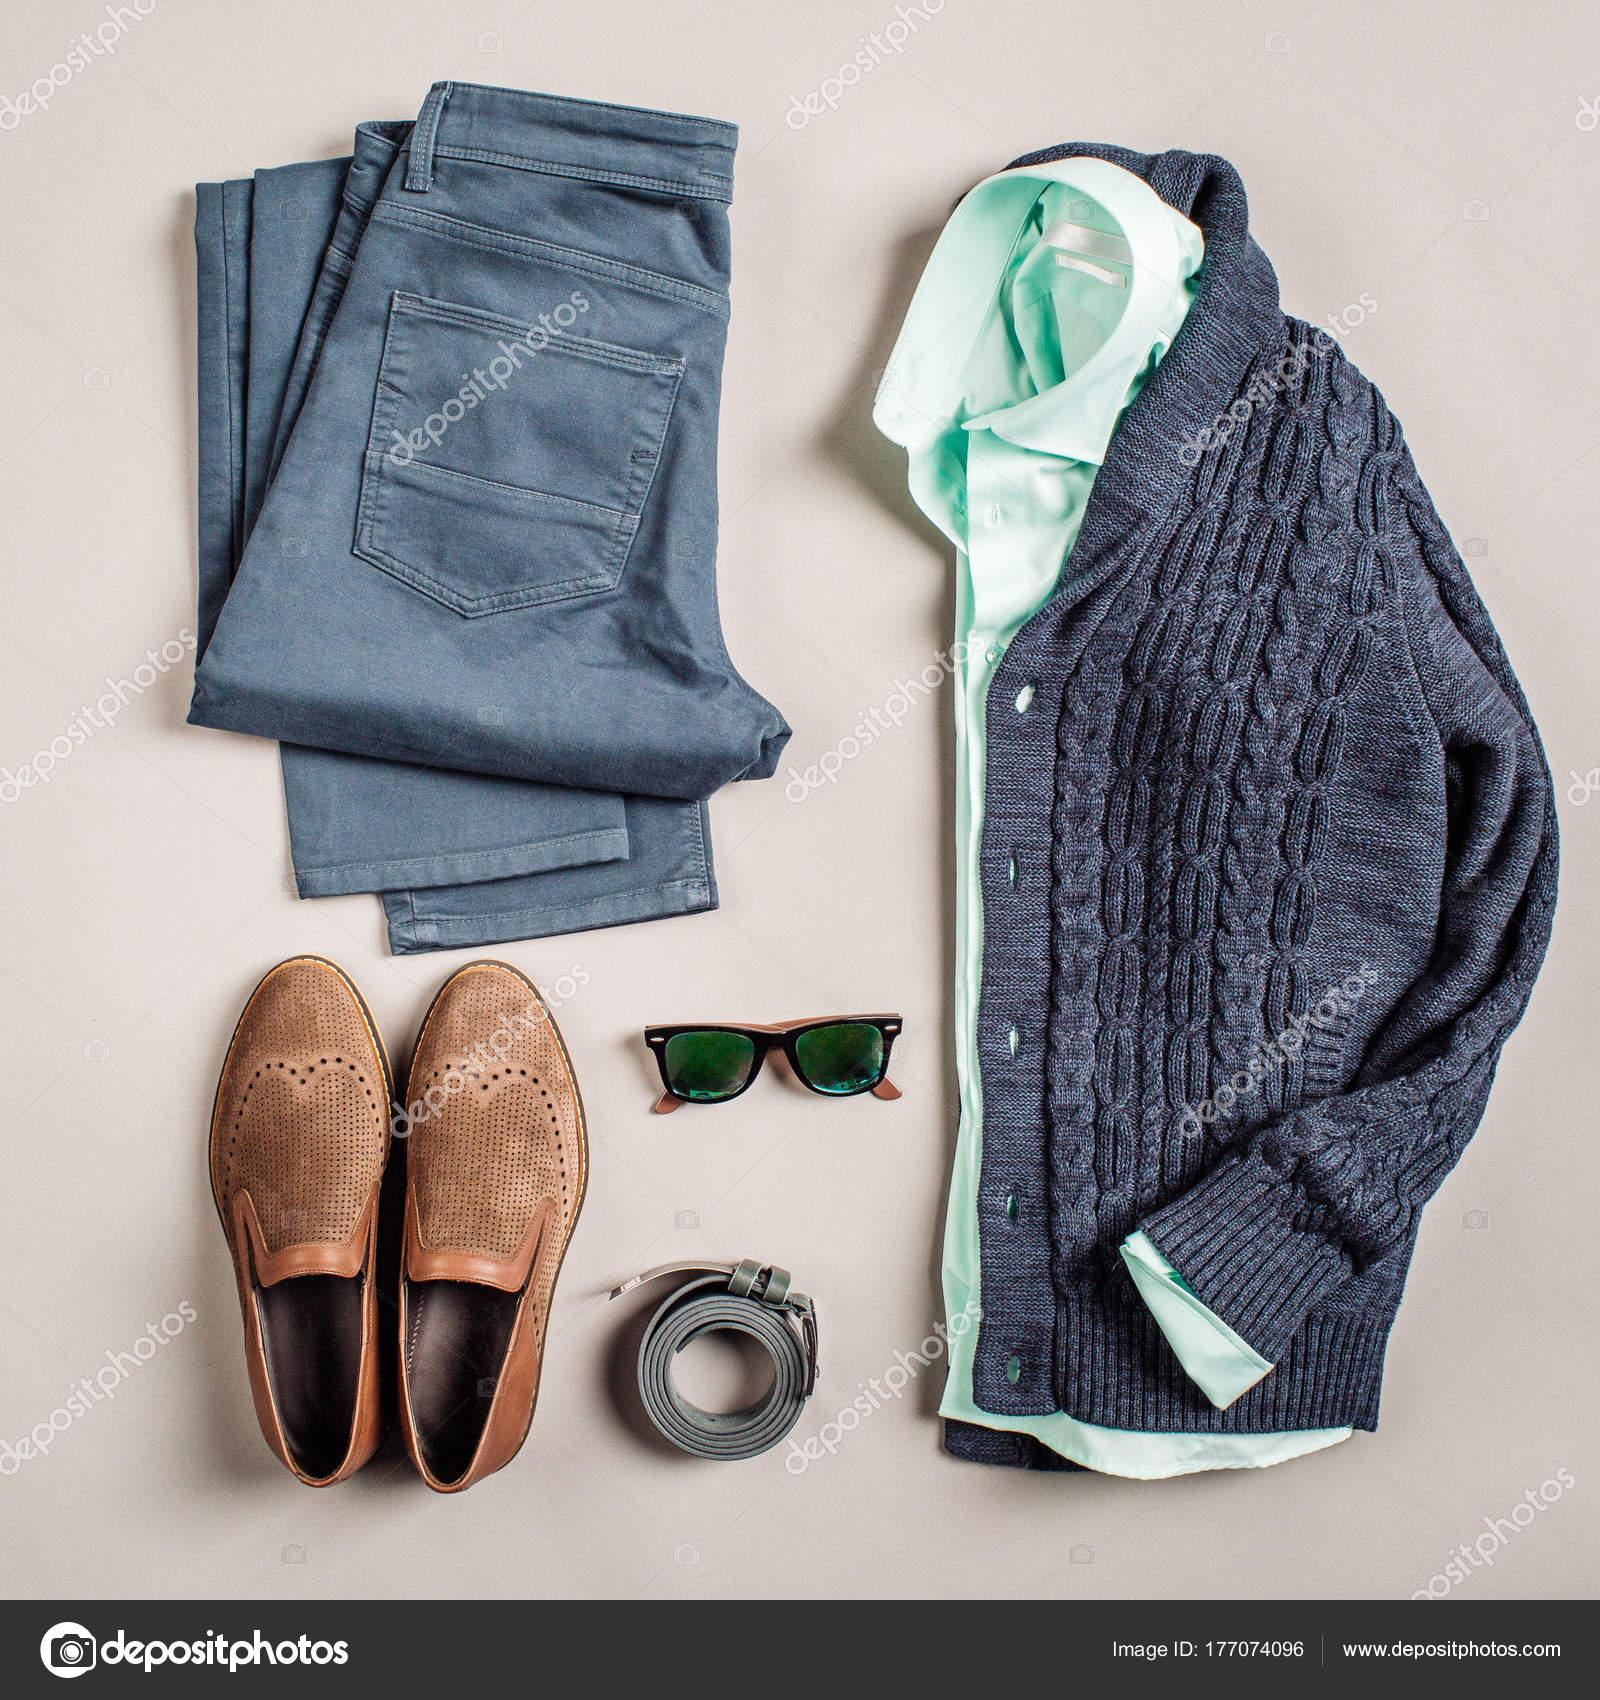 504128eb3a4a2 conjunto de moda de lujo para hombres  chaqueta